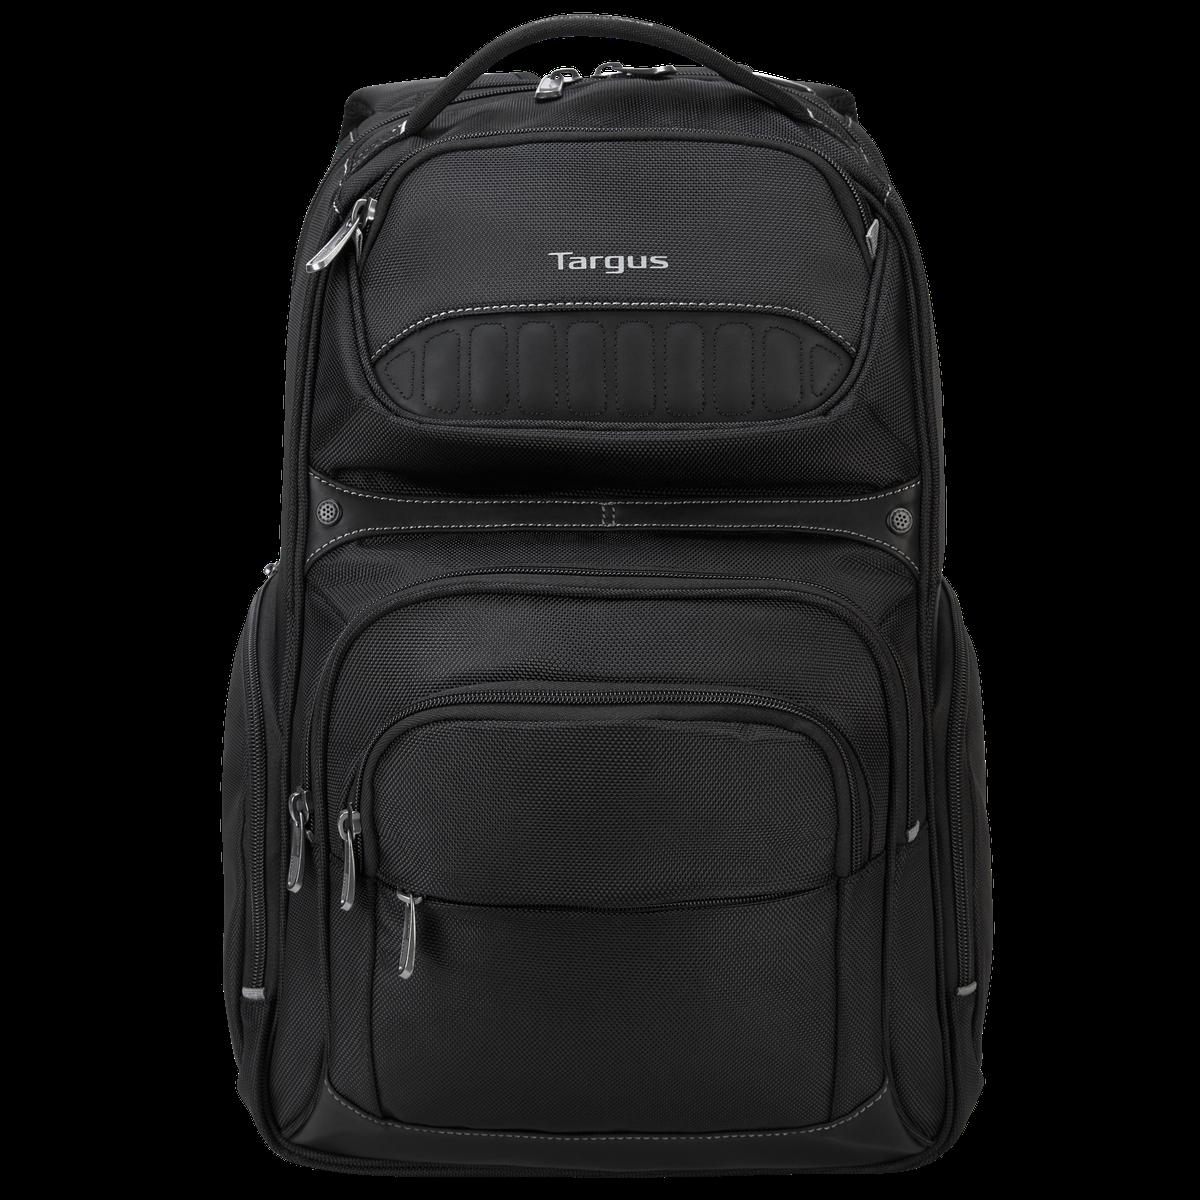 "15.6"" Legend IQ Backpack - TSB705US - Black: Backpacks: Targus"